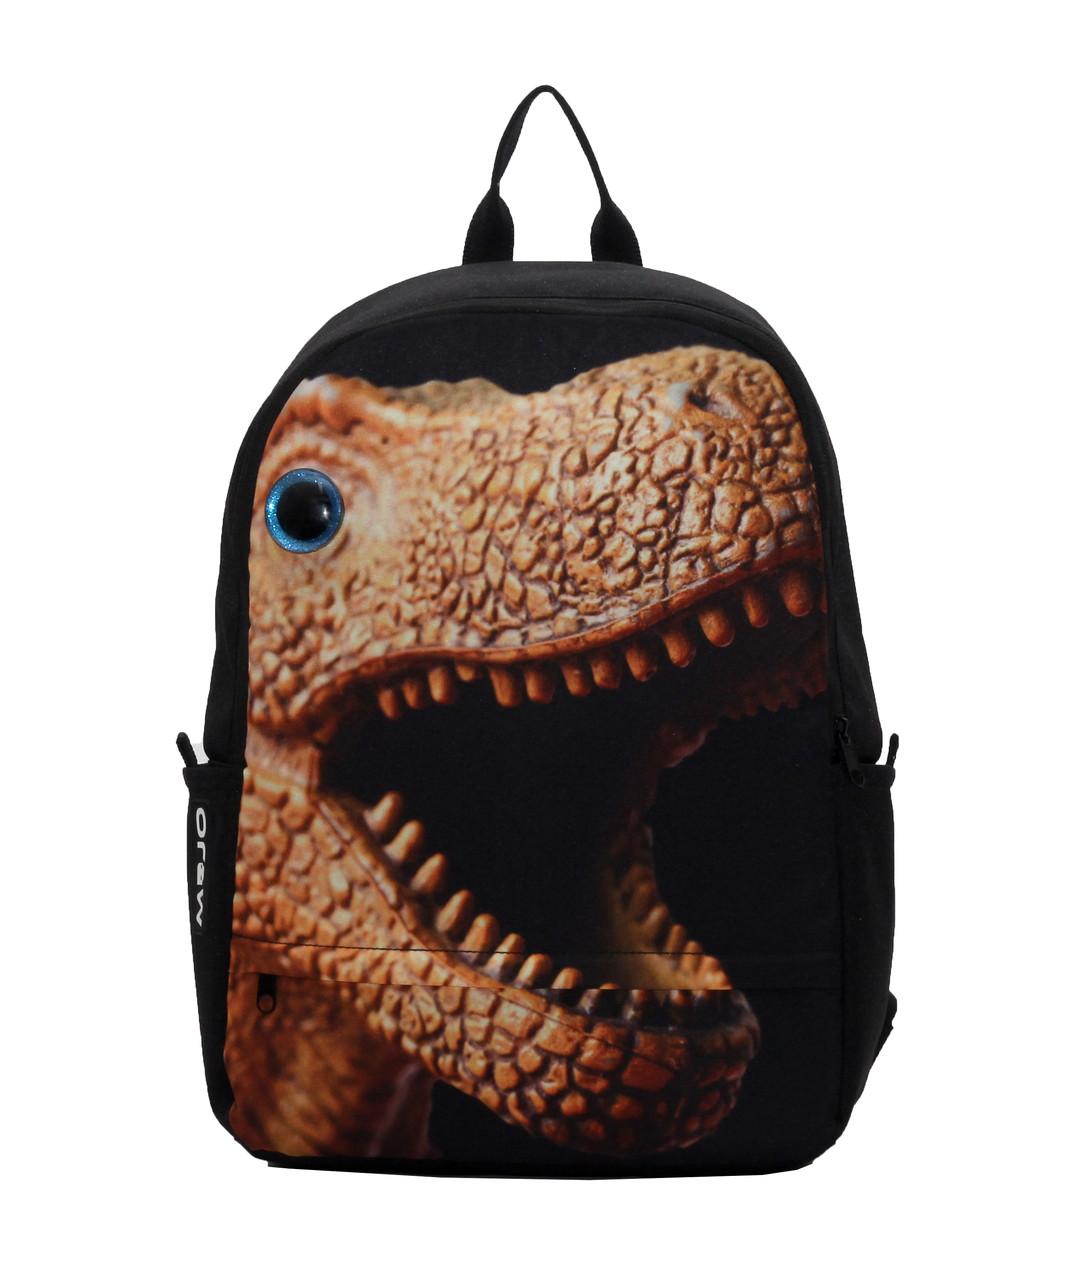 Рюкзак Mojo Dinomite чорный мульти (KAA9984580)